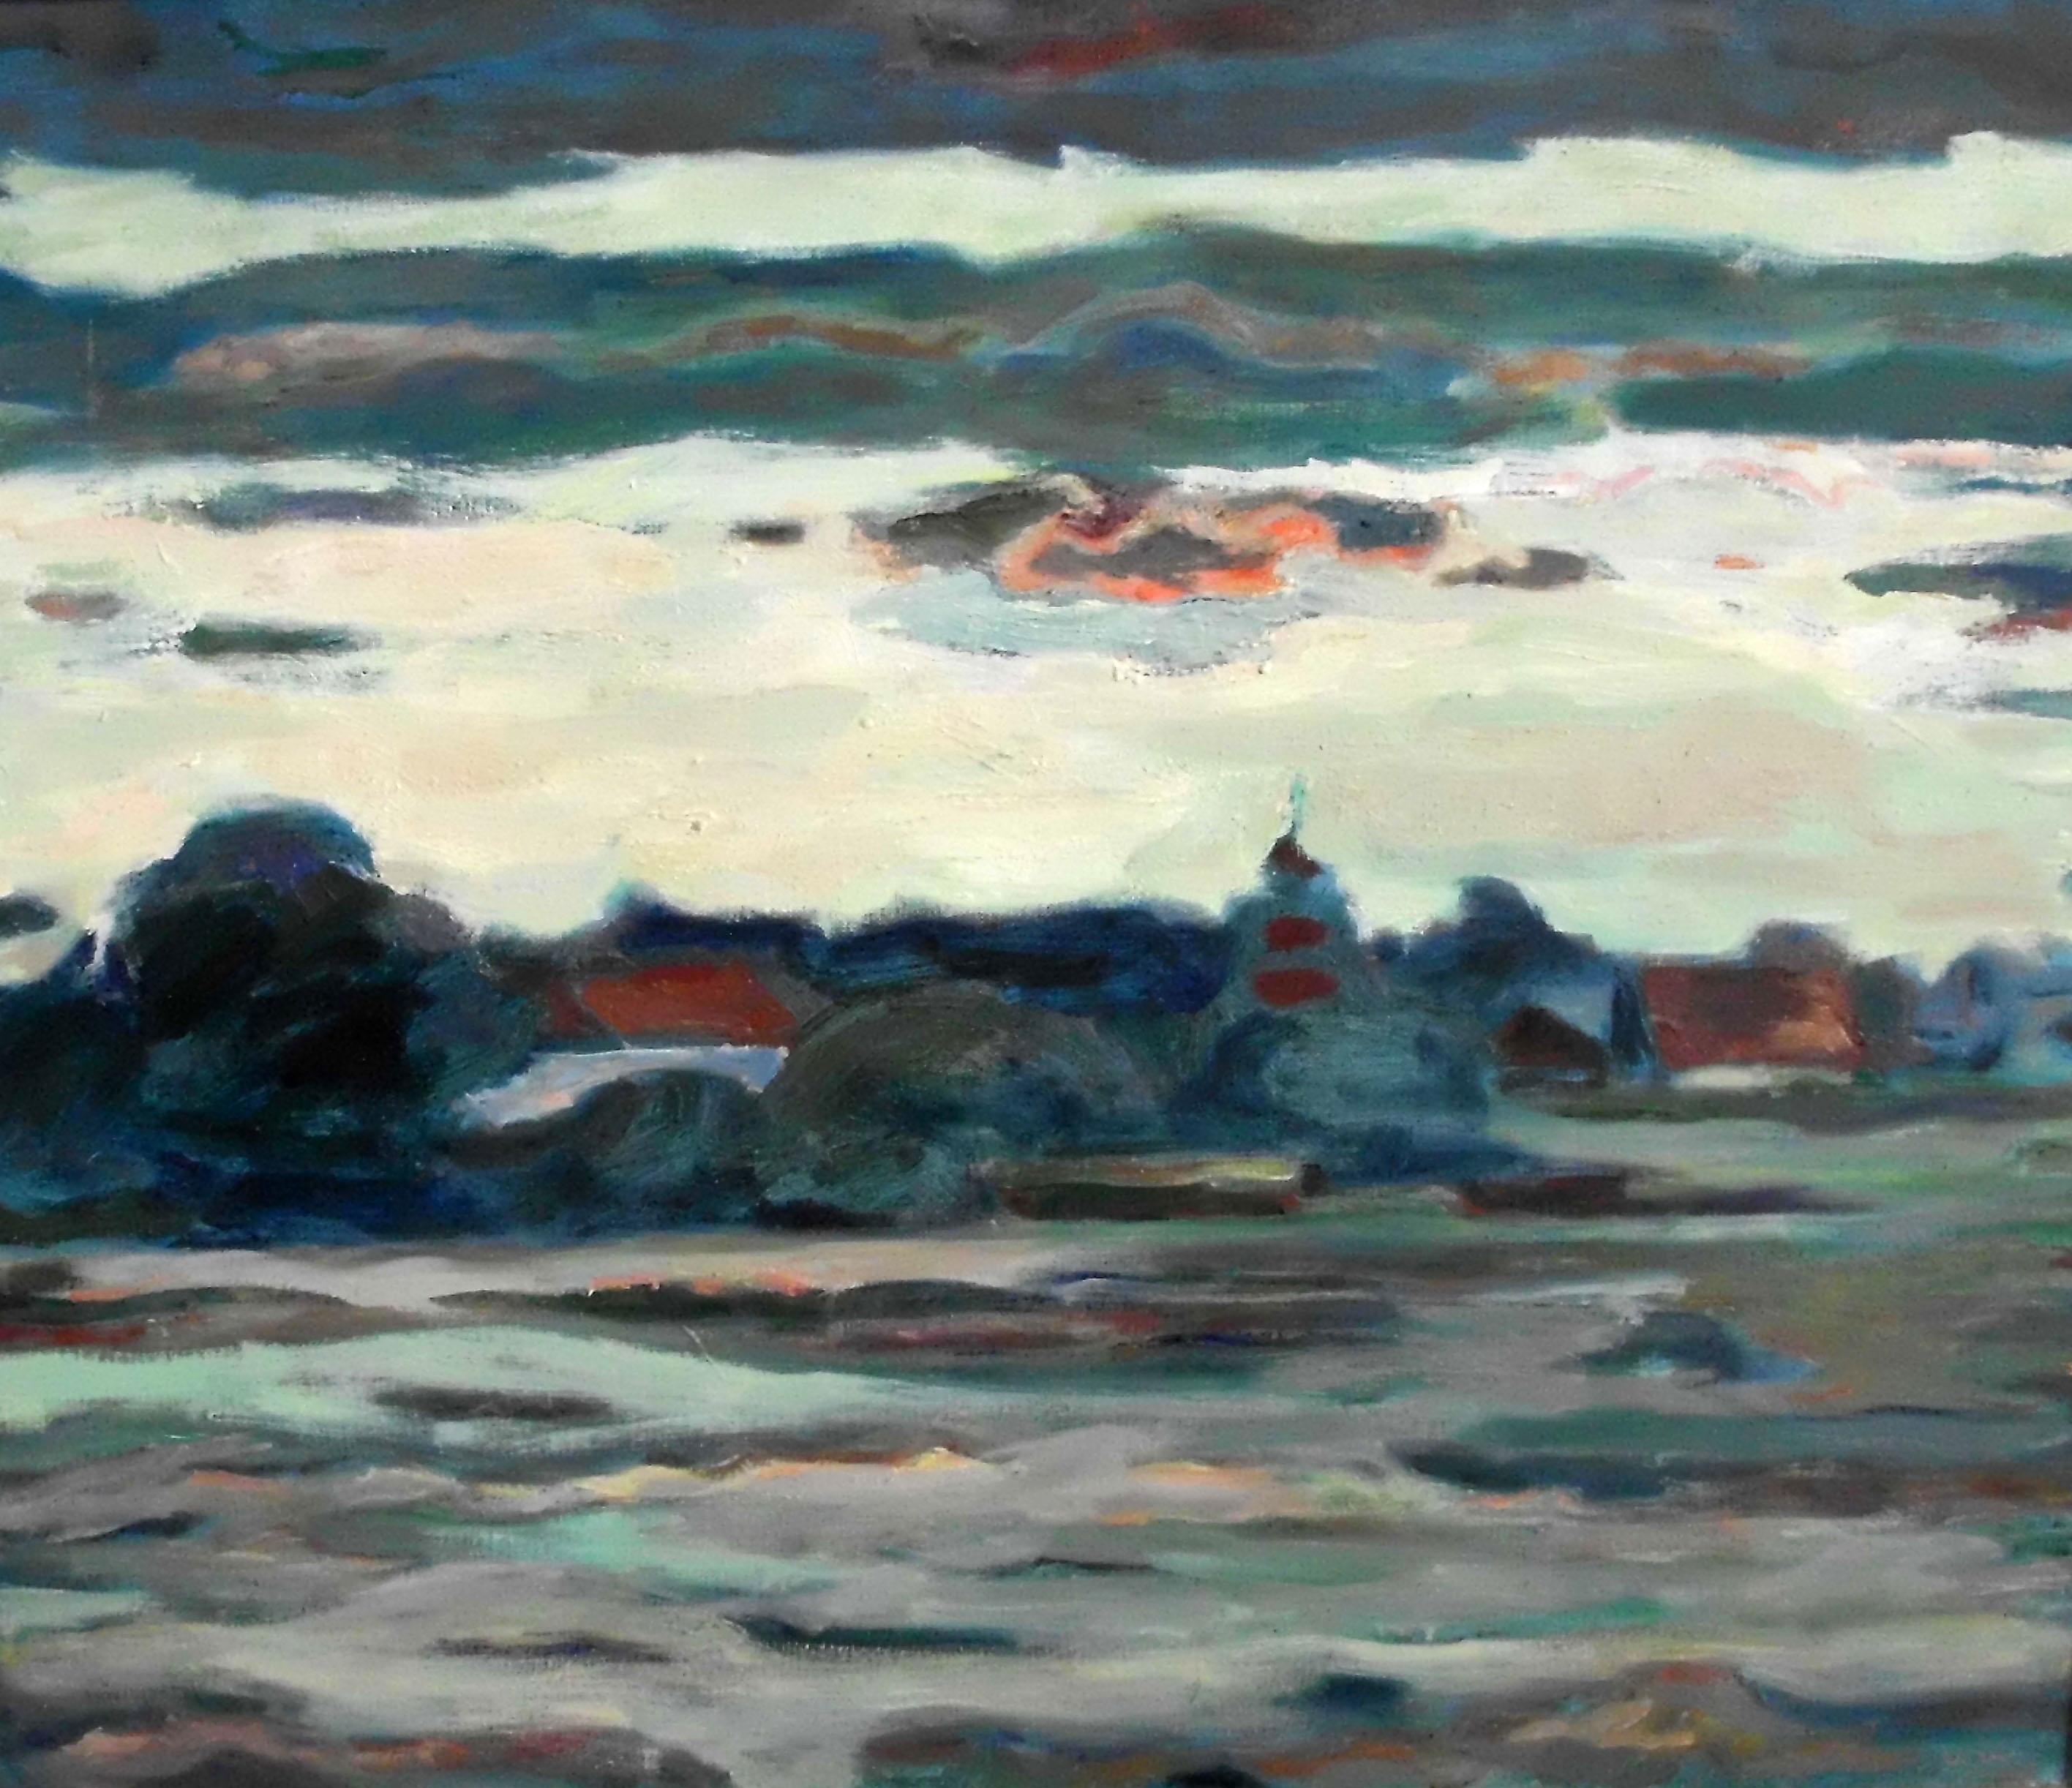 Ute Wittig - Moritzburg am Abend